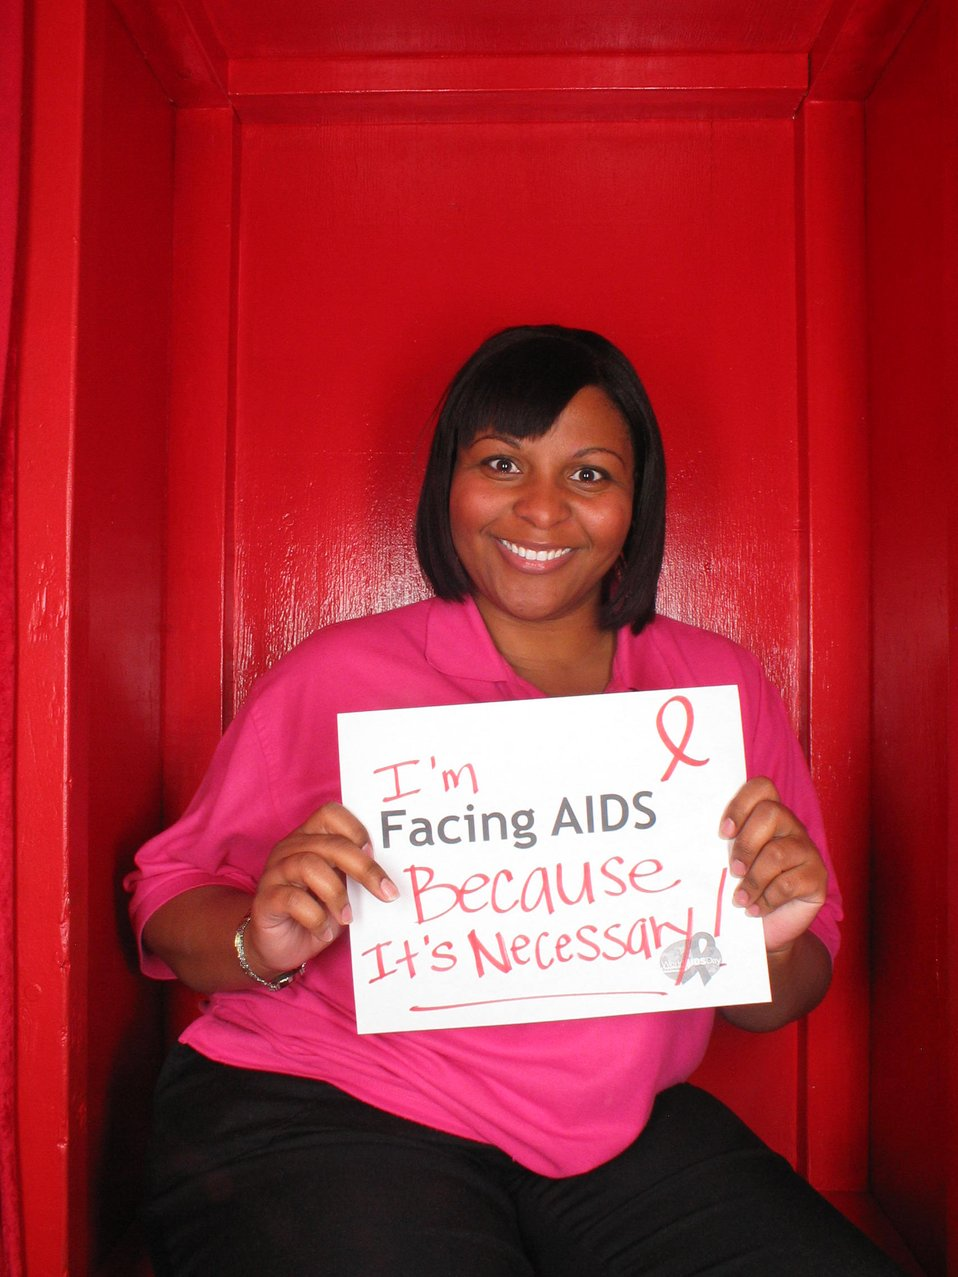 I'm facing Facing AIDS because its necessary!